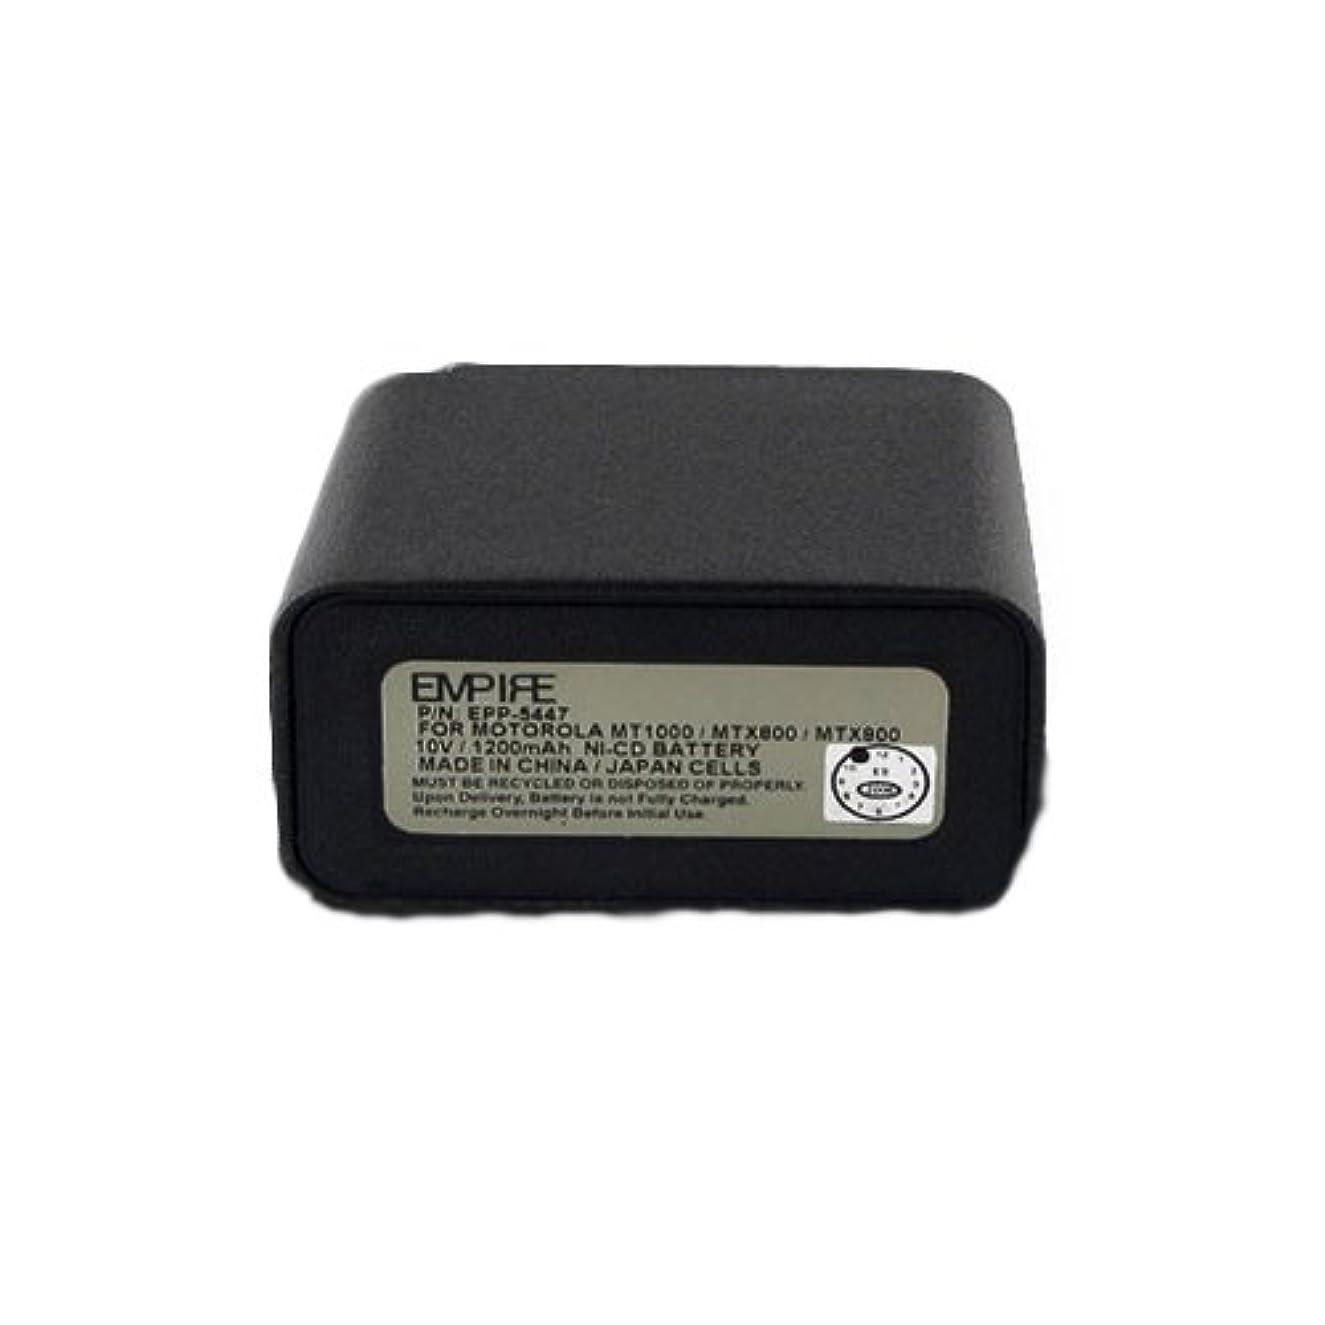 Motorola MTX 820 2-Way Radio Battery (Ni-CD 10V 1200mAh) Rechargeable Battery - Replacement for Motorola NTN5447A Battery